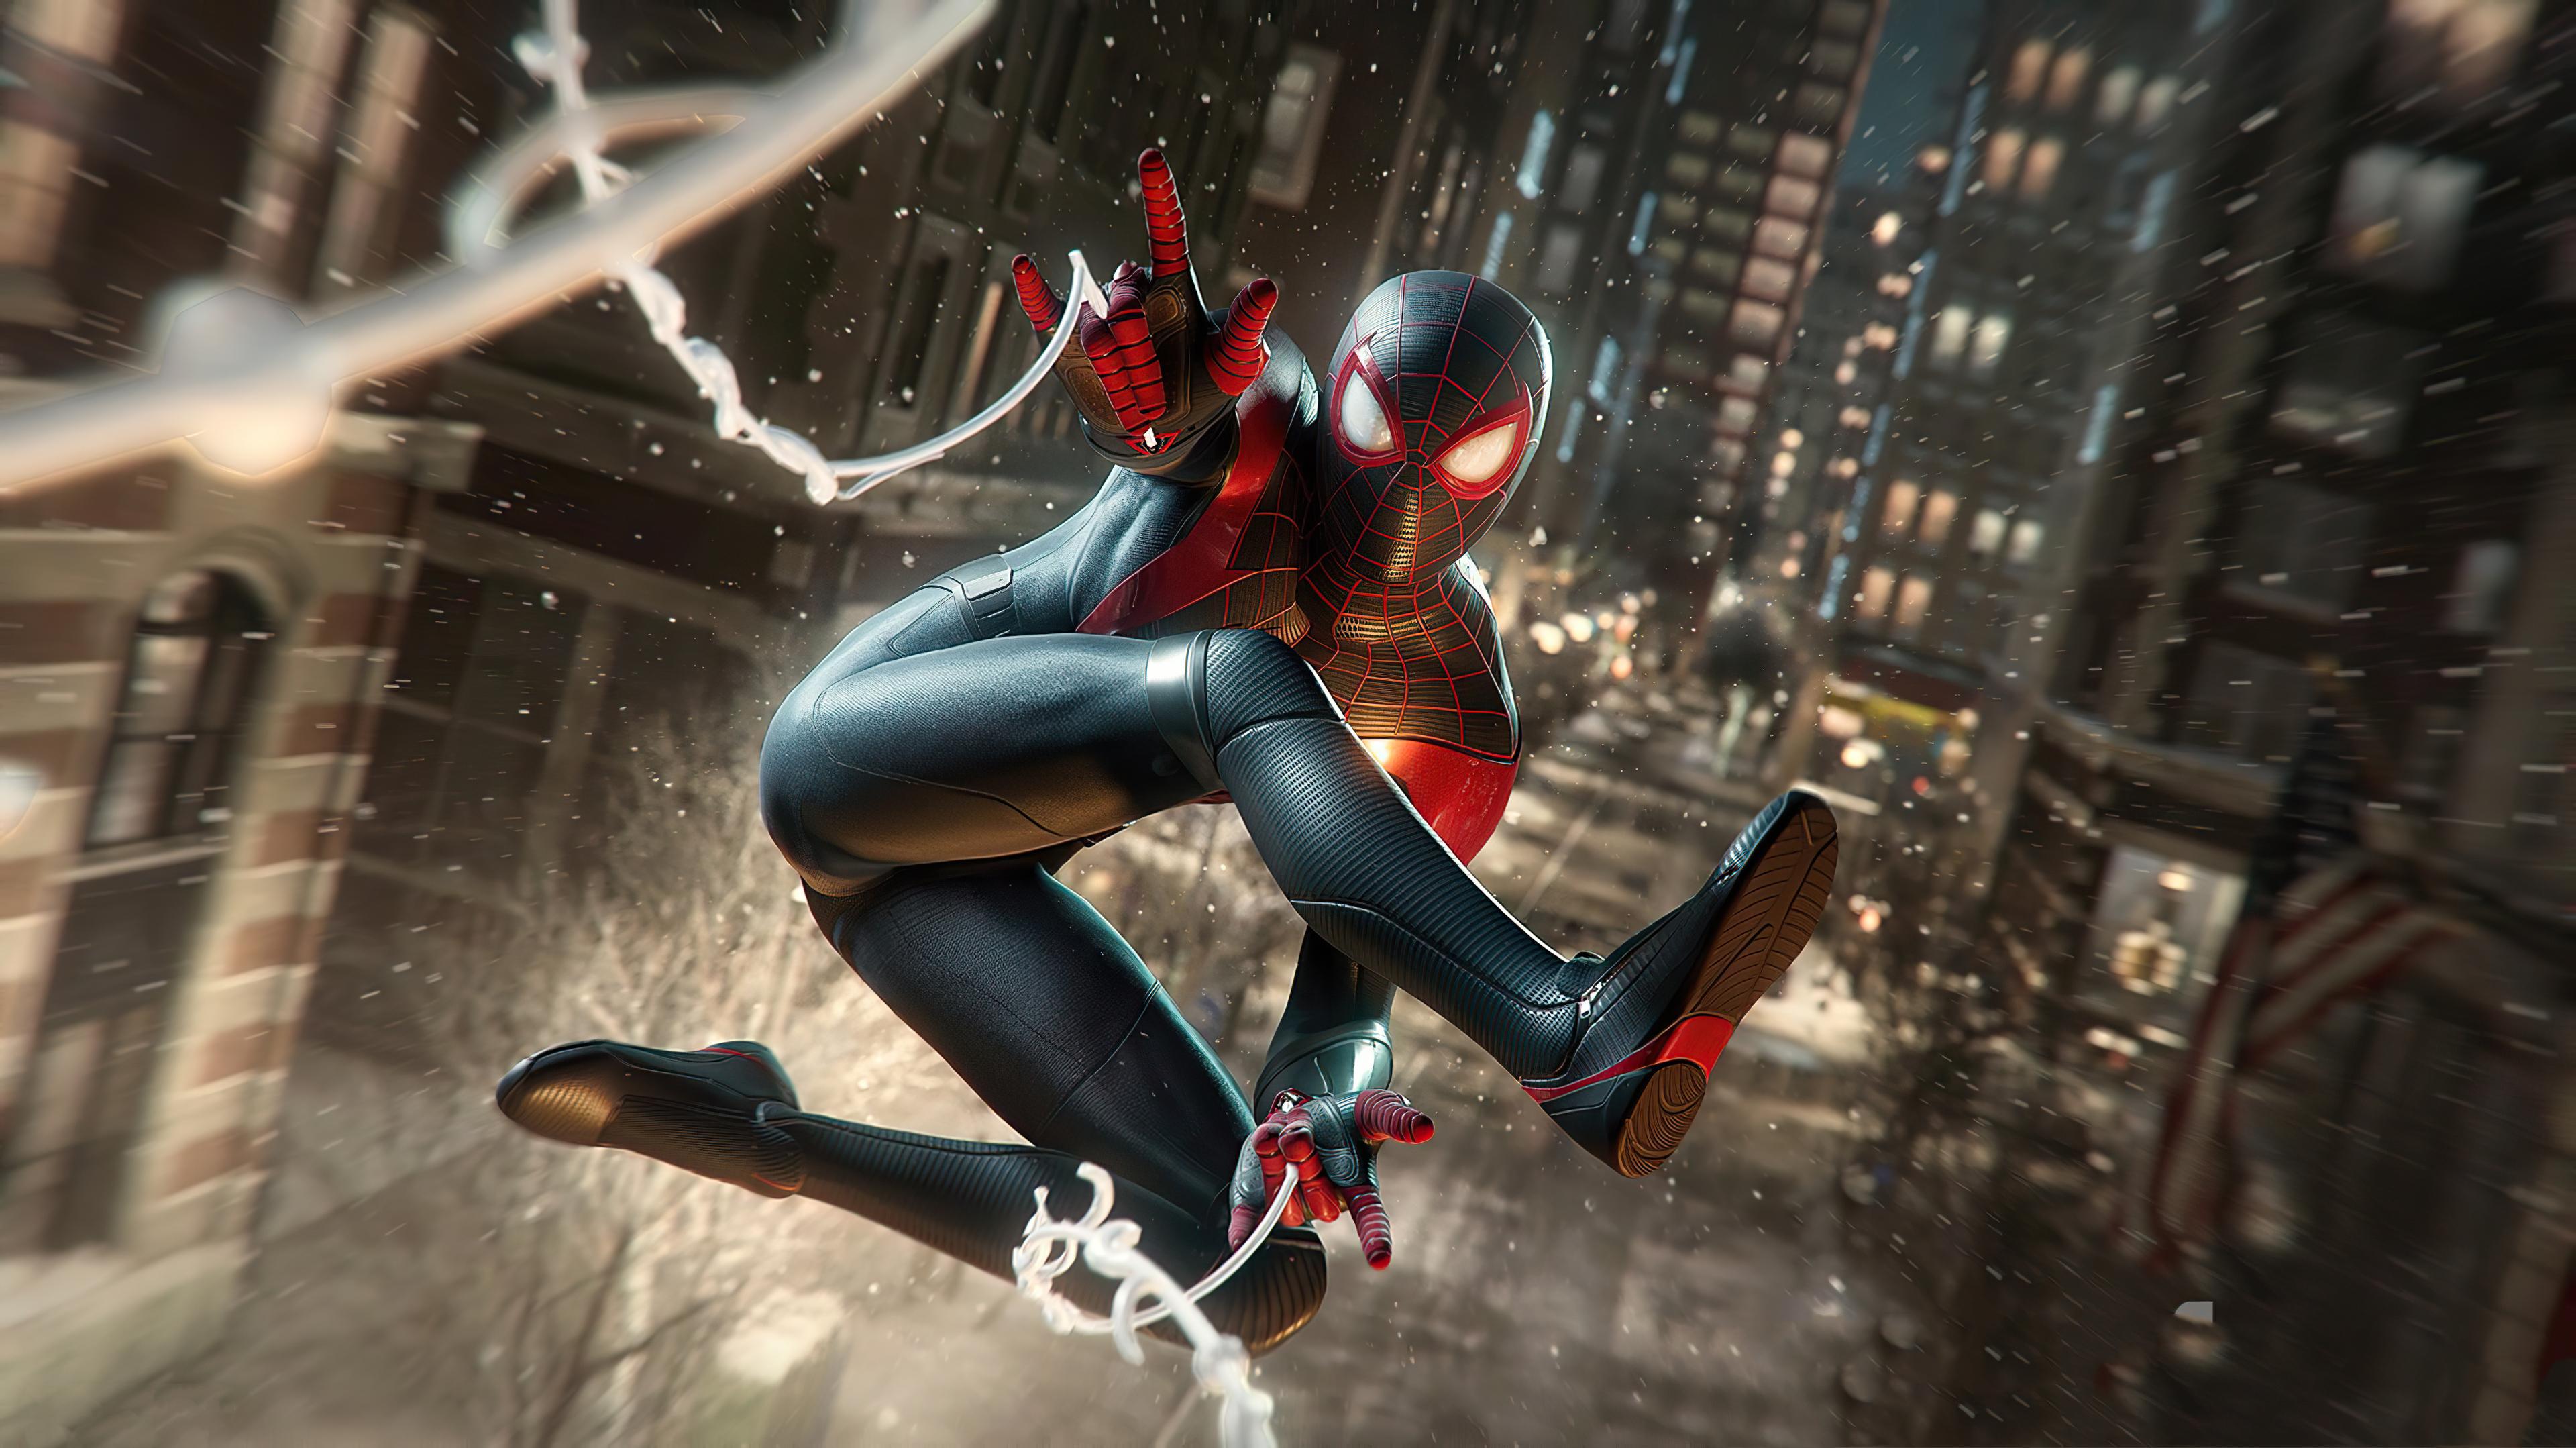 Marvel S Spider Man Miles Morales 4k Wallpaper Playstation 5 2020 Games Games 3110